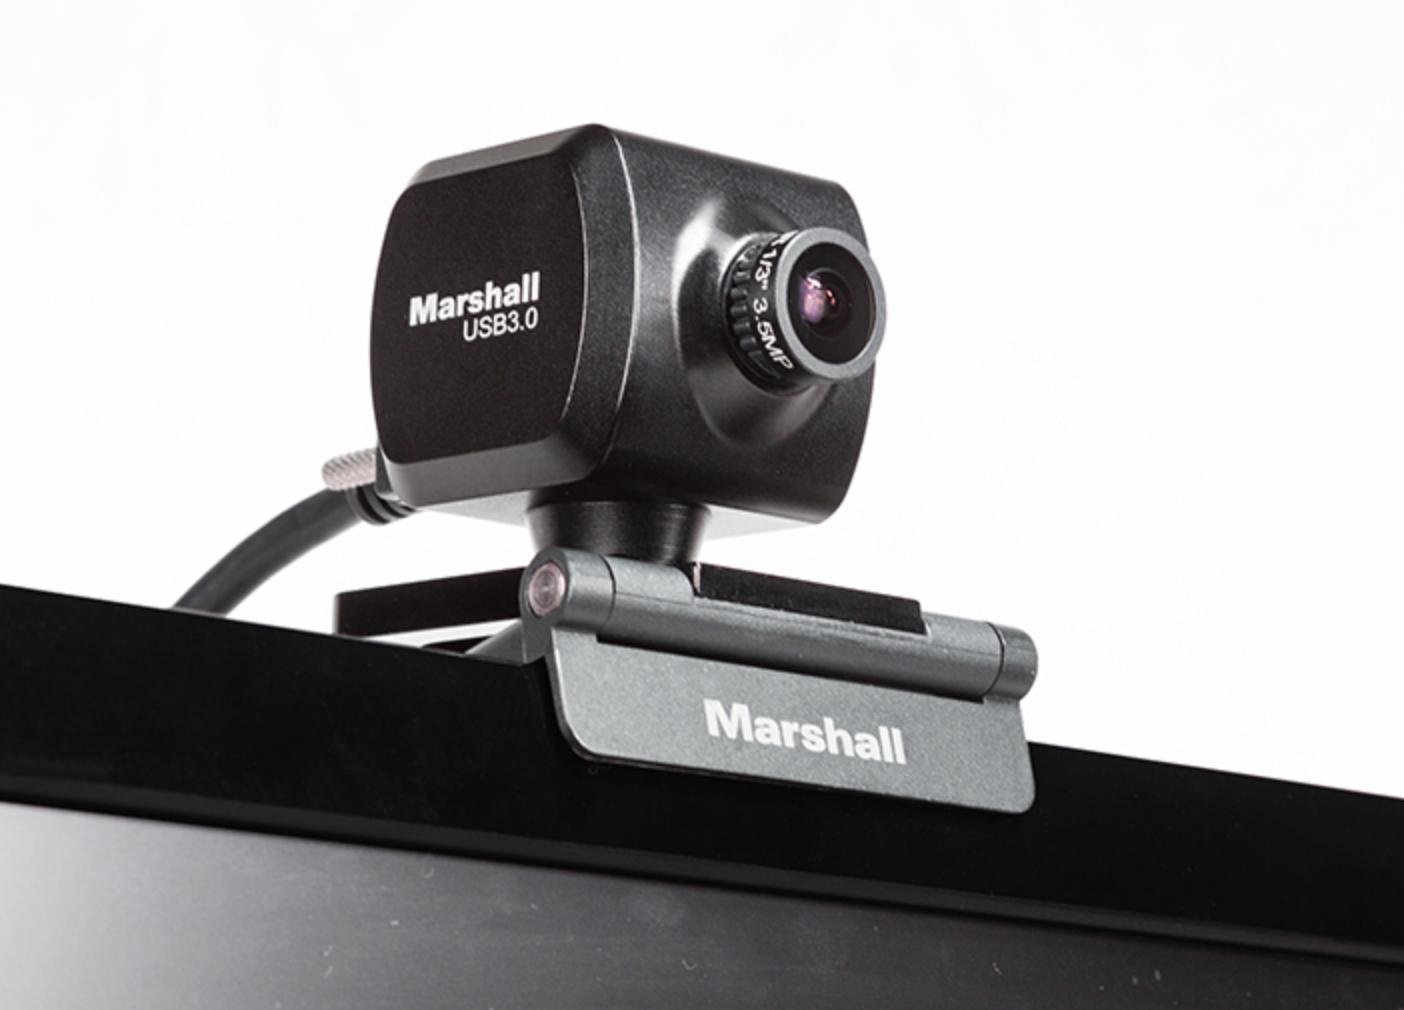 Marshall CV503-U3 Miniature POV Camera for USB